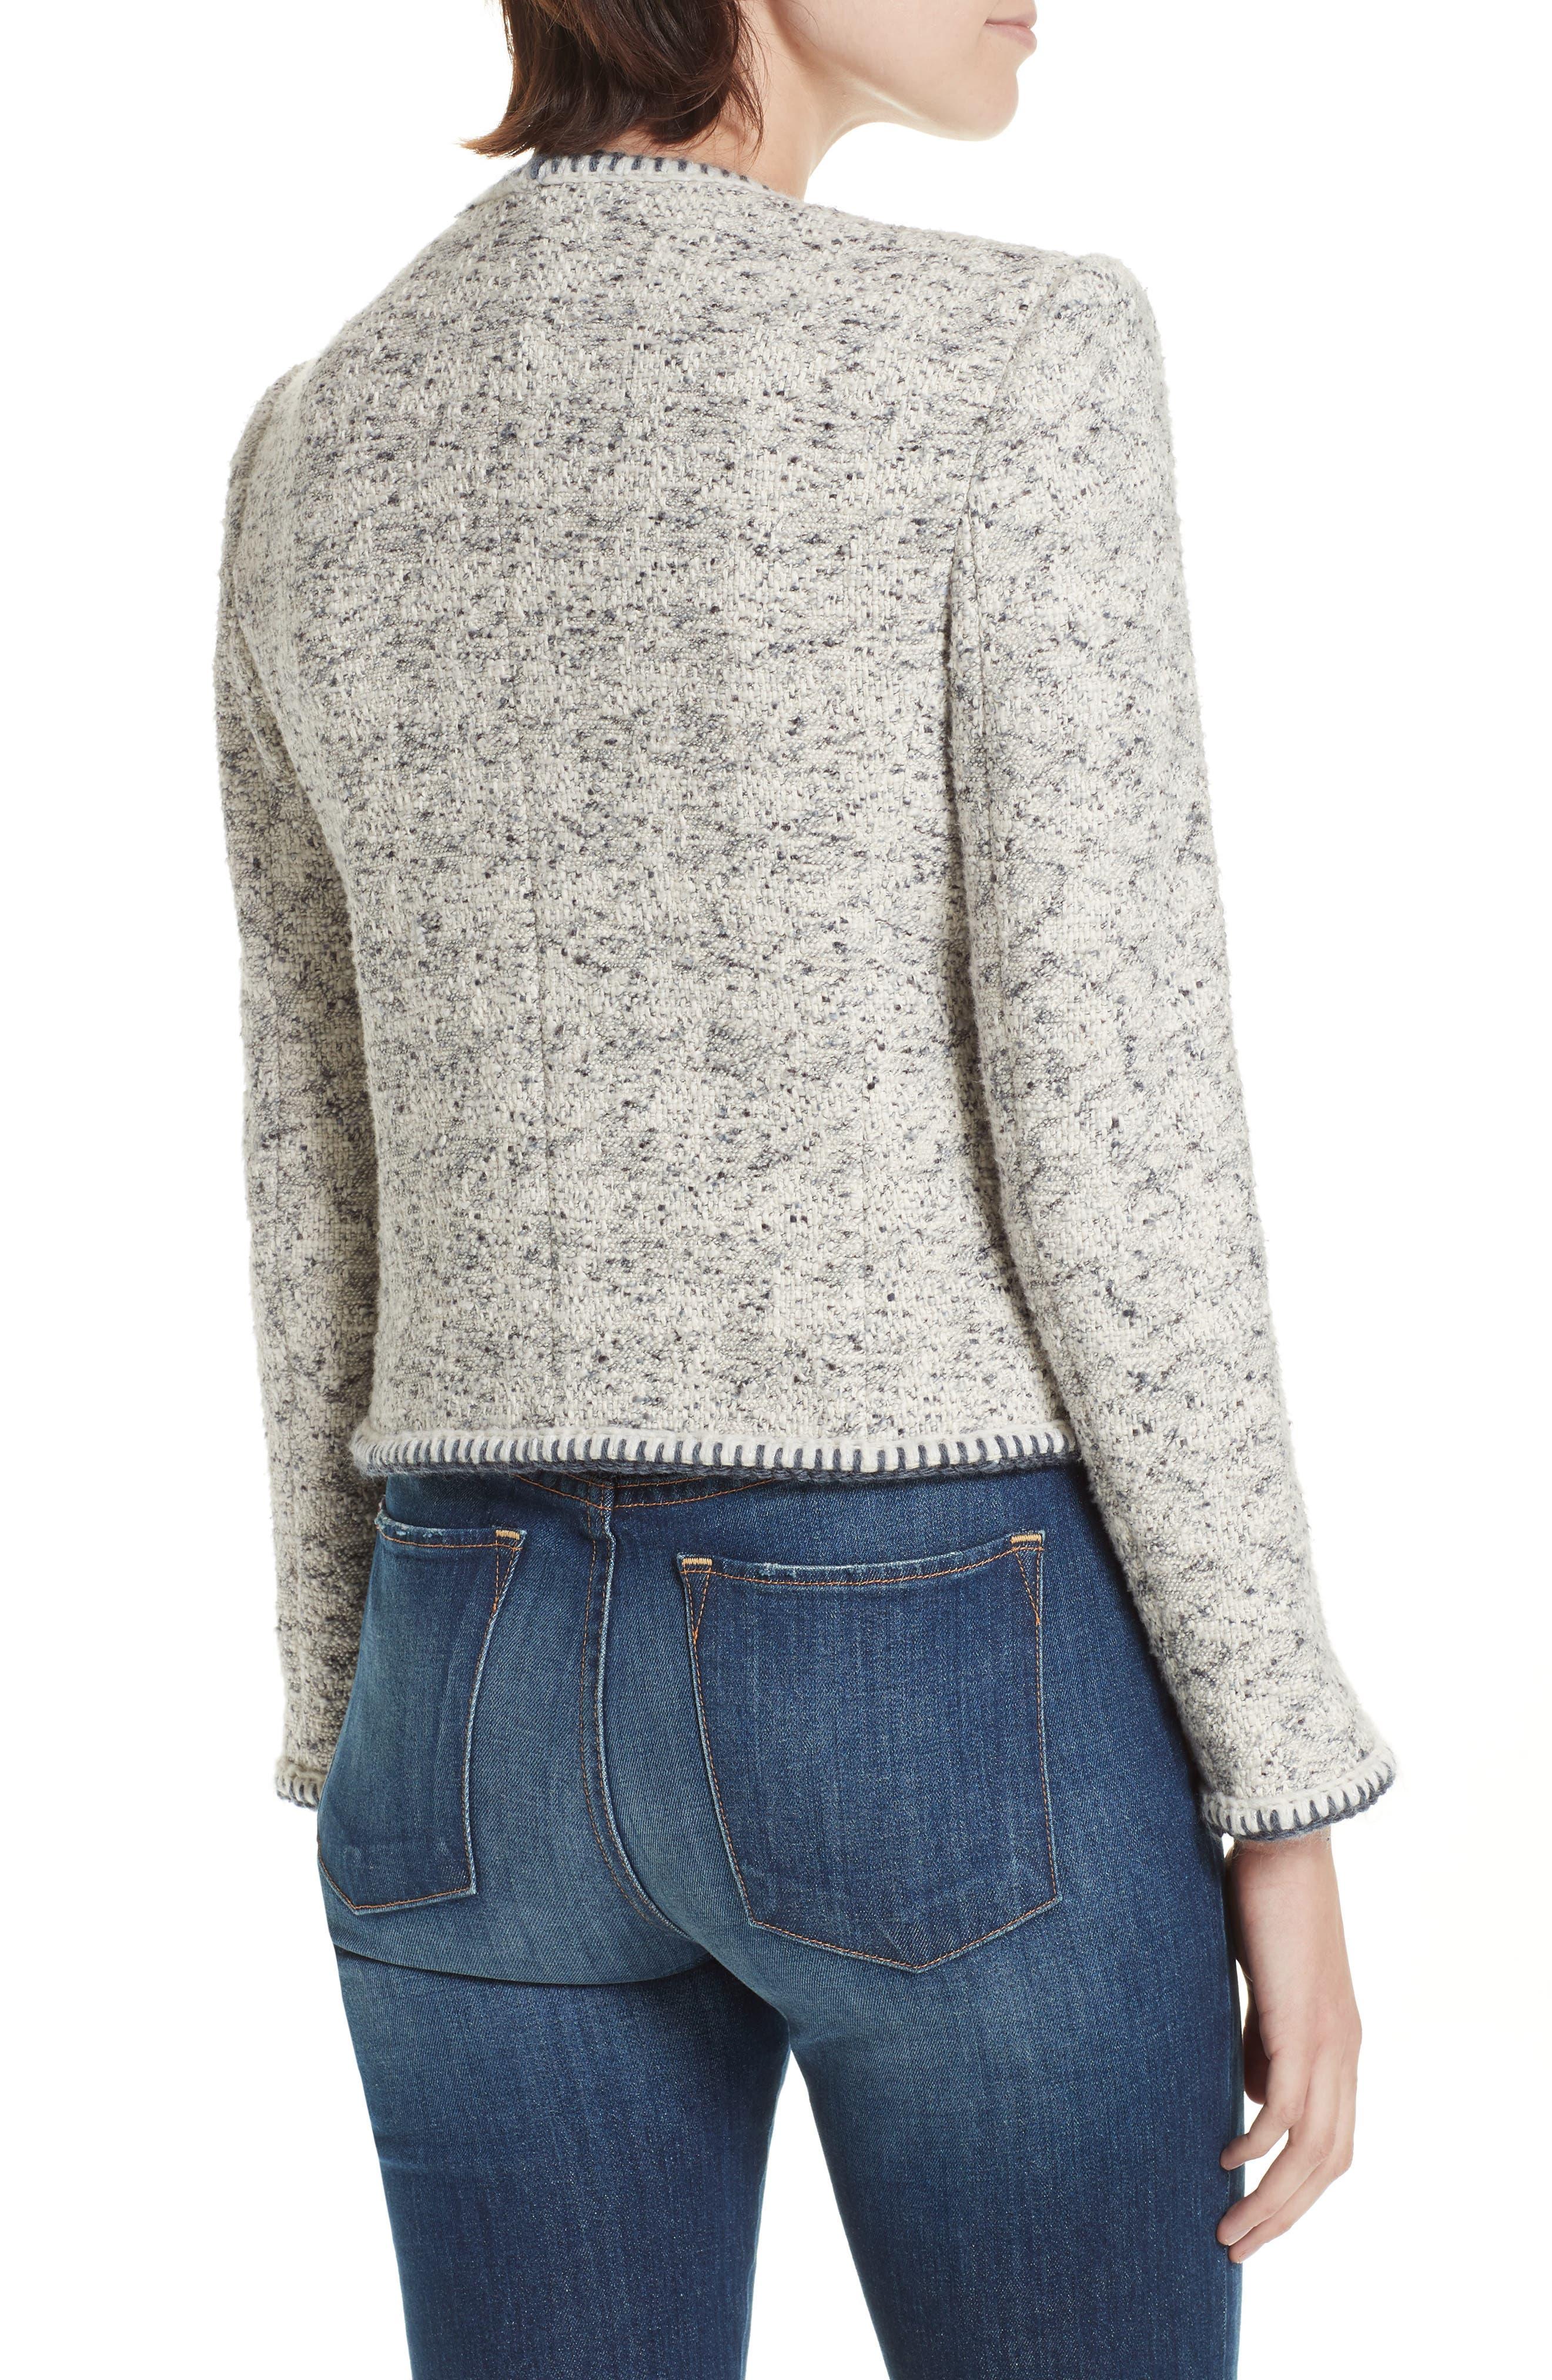 Speckled Tweed Jacket,                             Alternate thumbnail 2, color,                             054